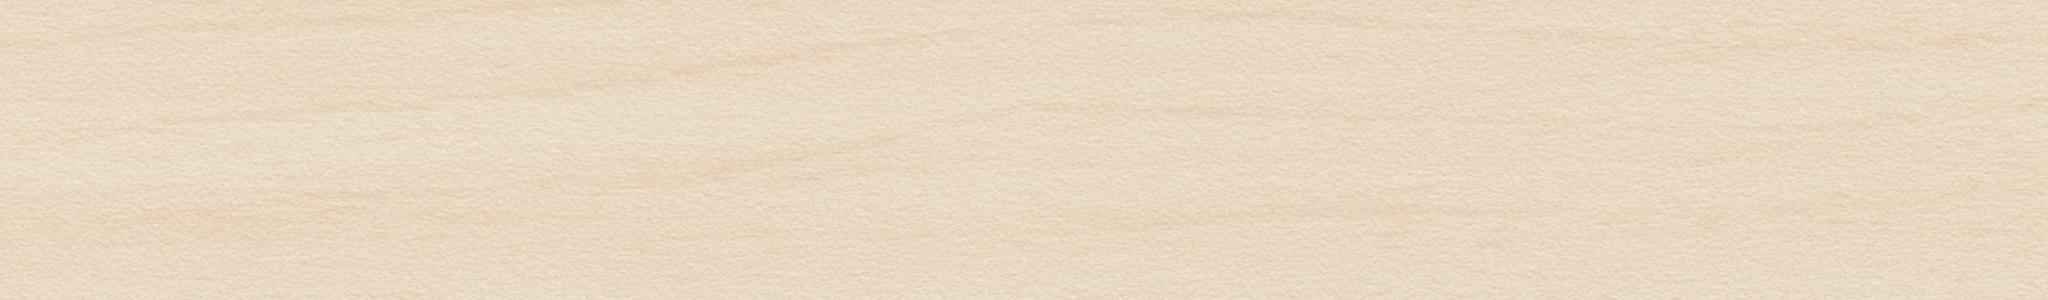 HD 272715 ABS hrana bříza sněžná perla